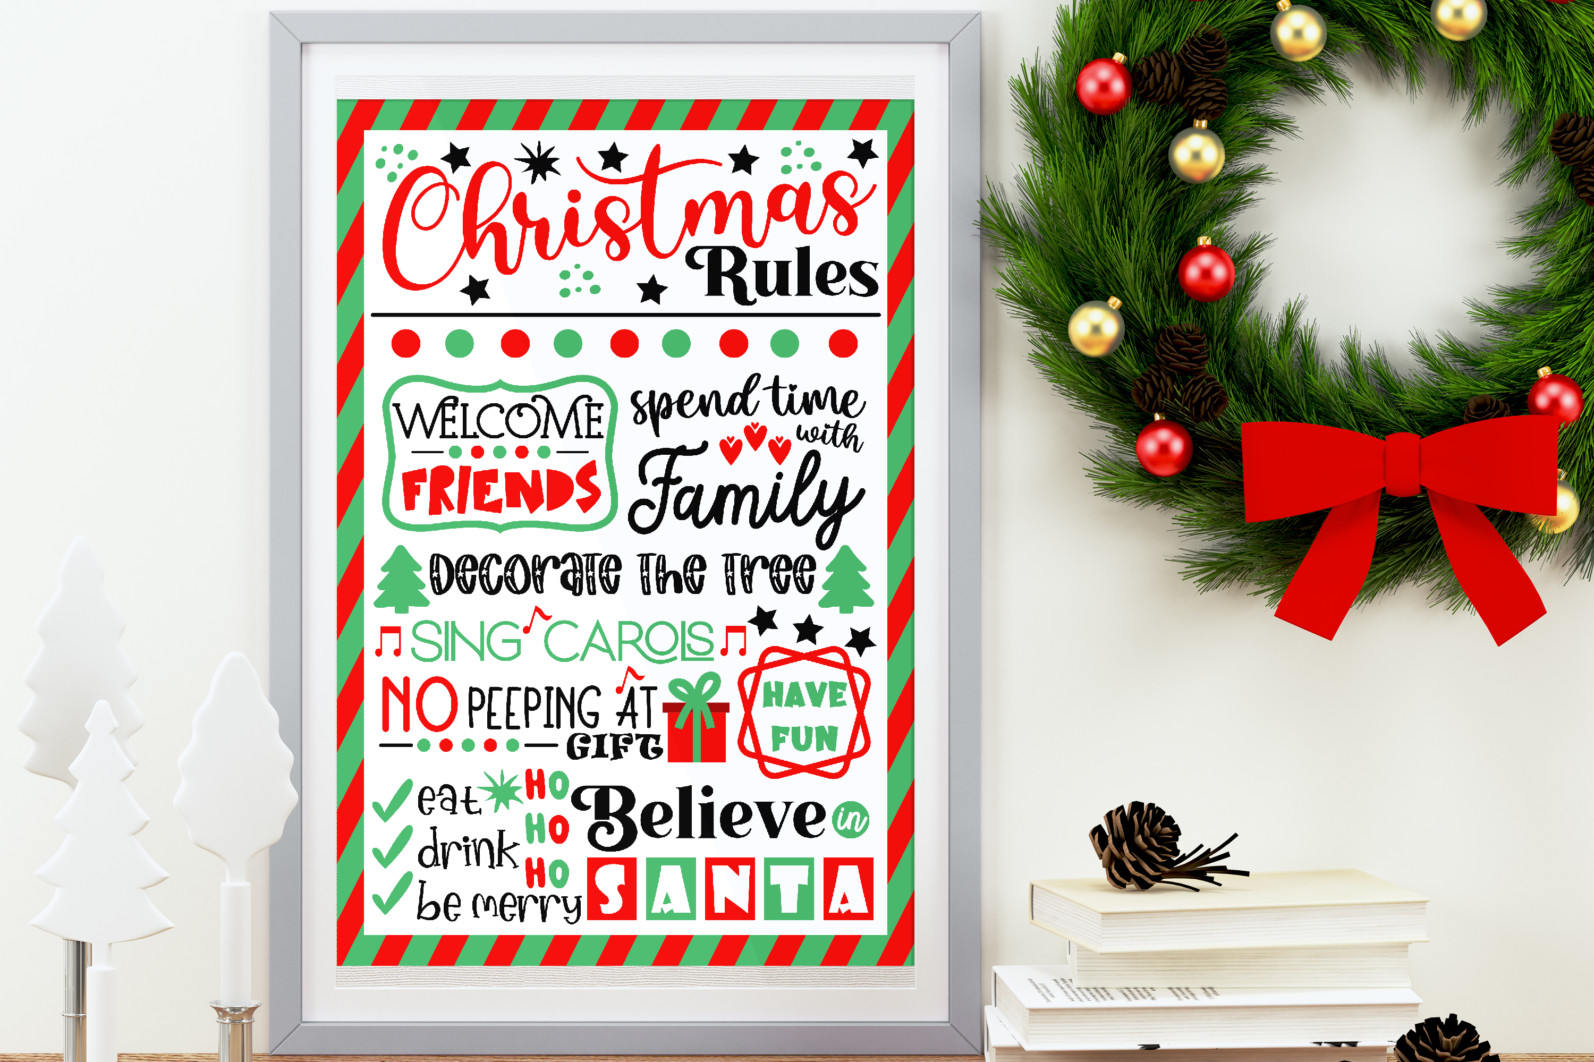 Christmas bundle Vol. 1. Christmas stickers. Christmas SVG bundle. - 27 Christmas svg Christmas rules SVG Christmas sign svg Christmas rules bundle Christmas house rules svg Christmas poster svg Winter svg Christmas decor scaled -